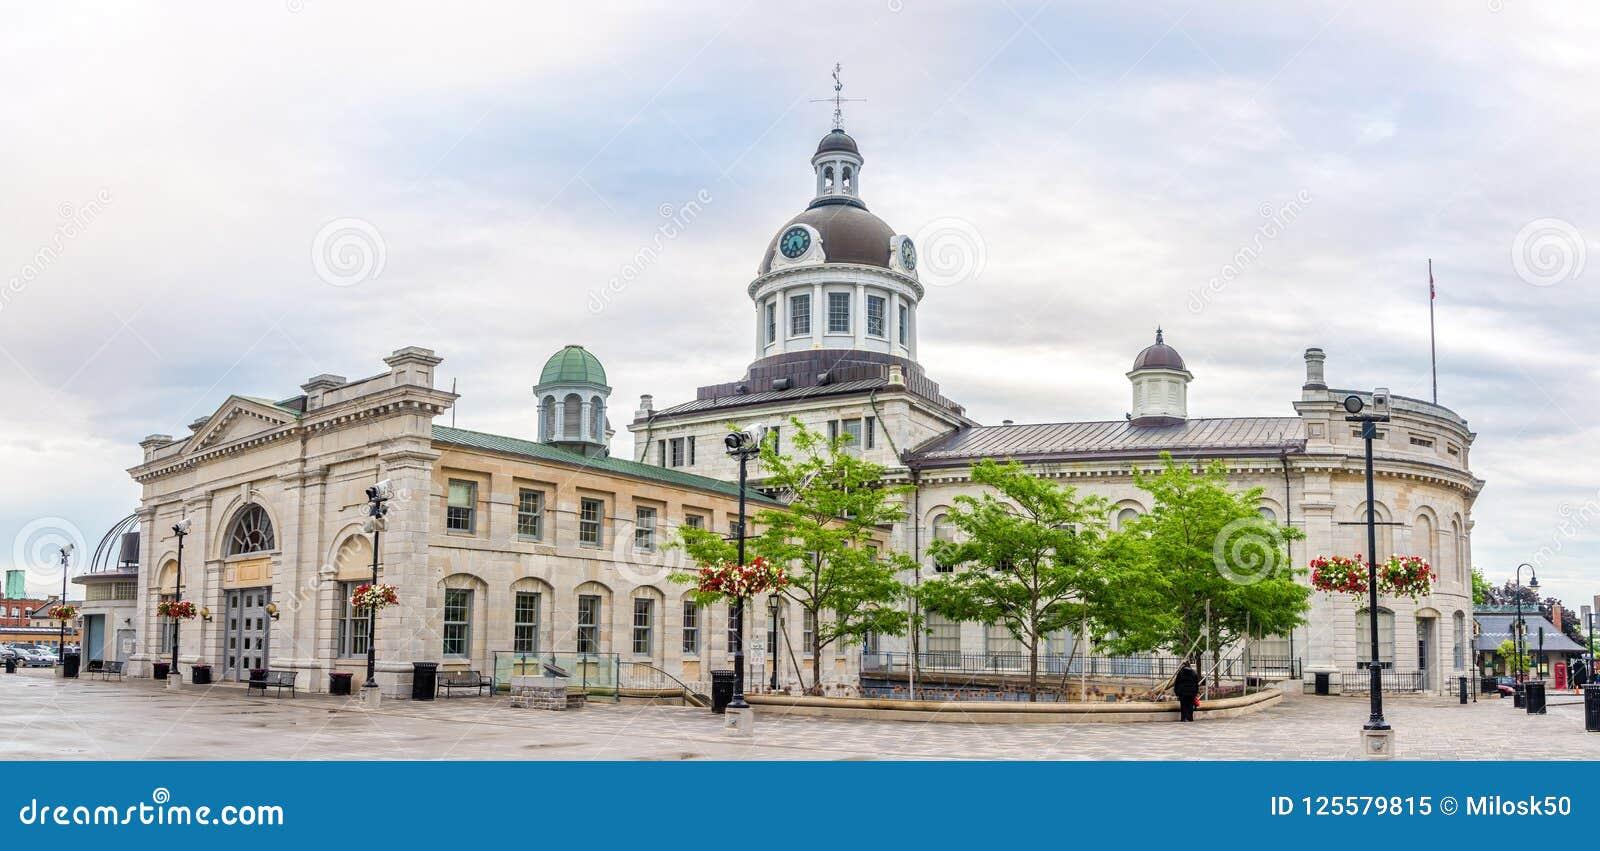 Panoramablick am Gebäude des Rathauses mit Markt in Kingston - Kanada